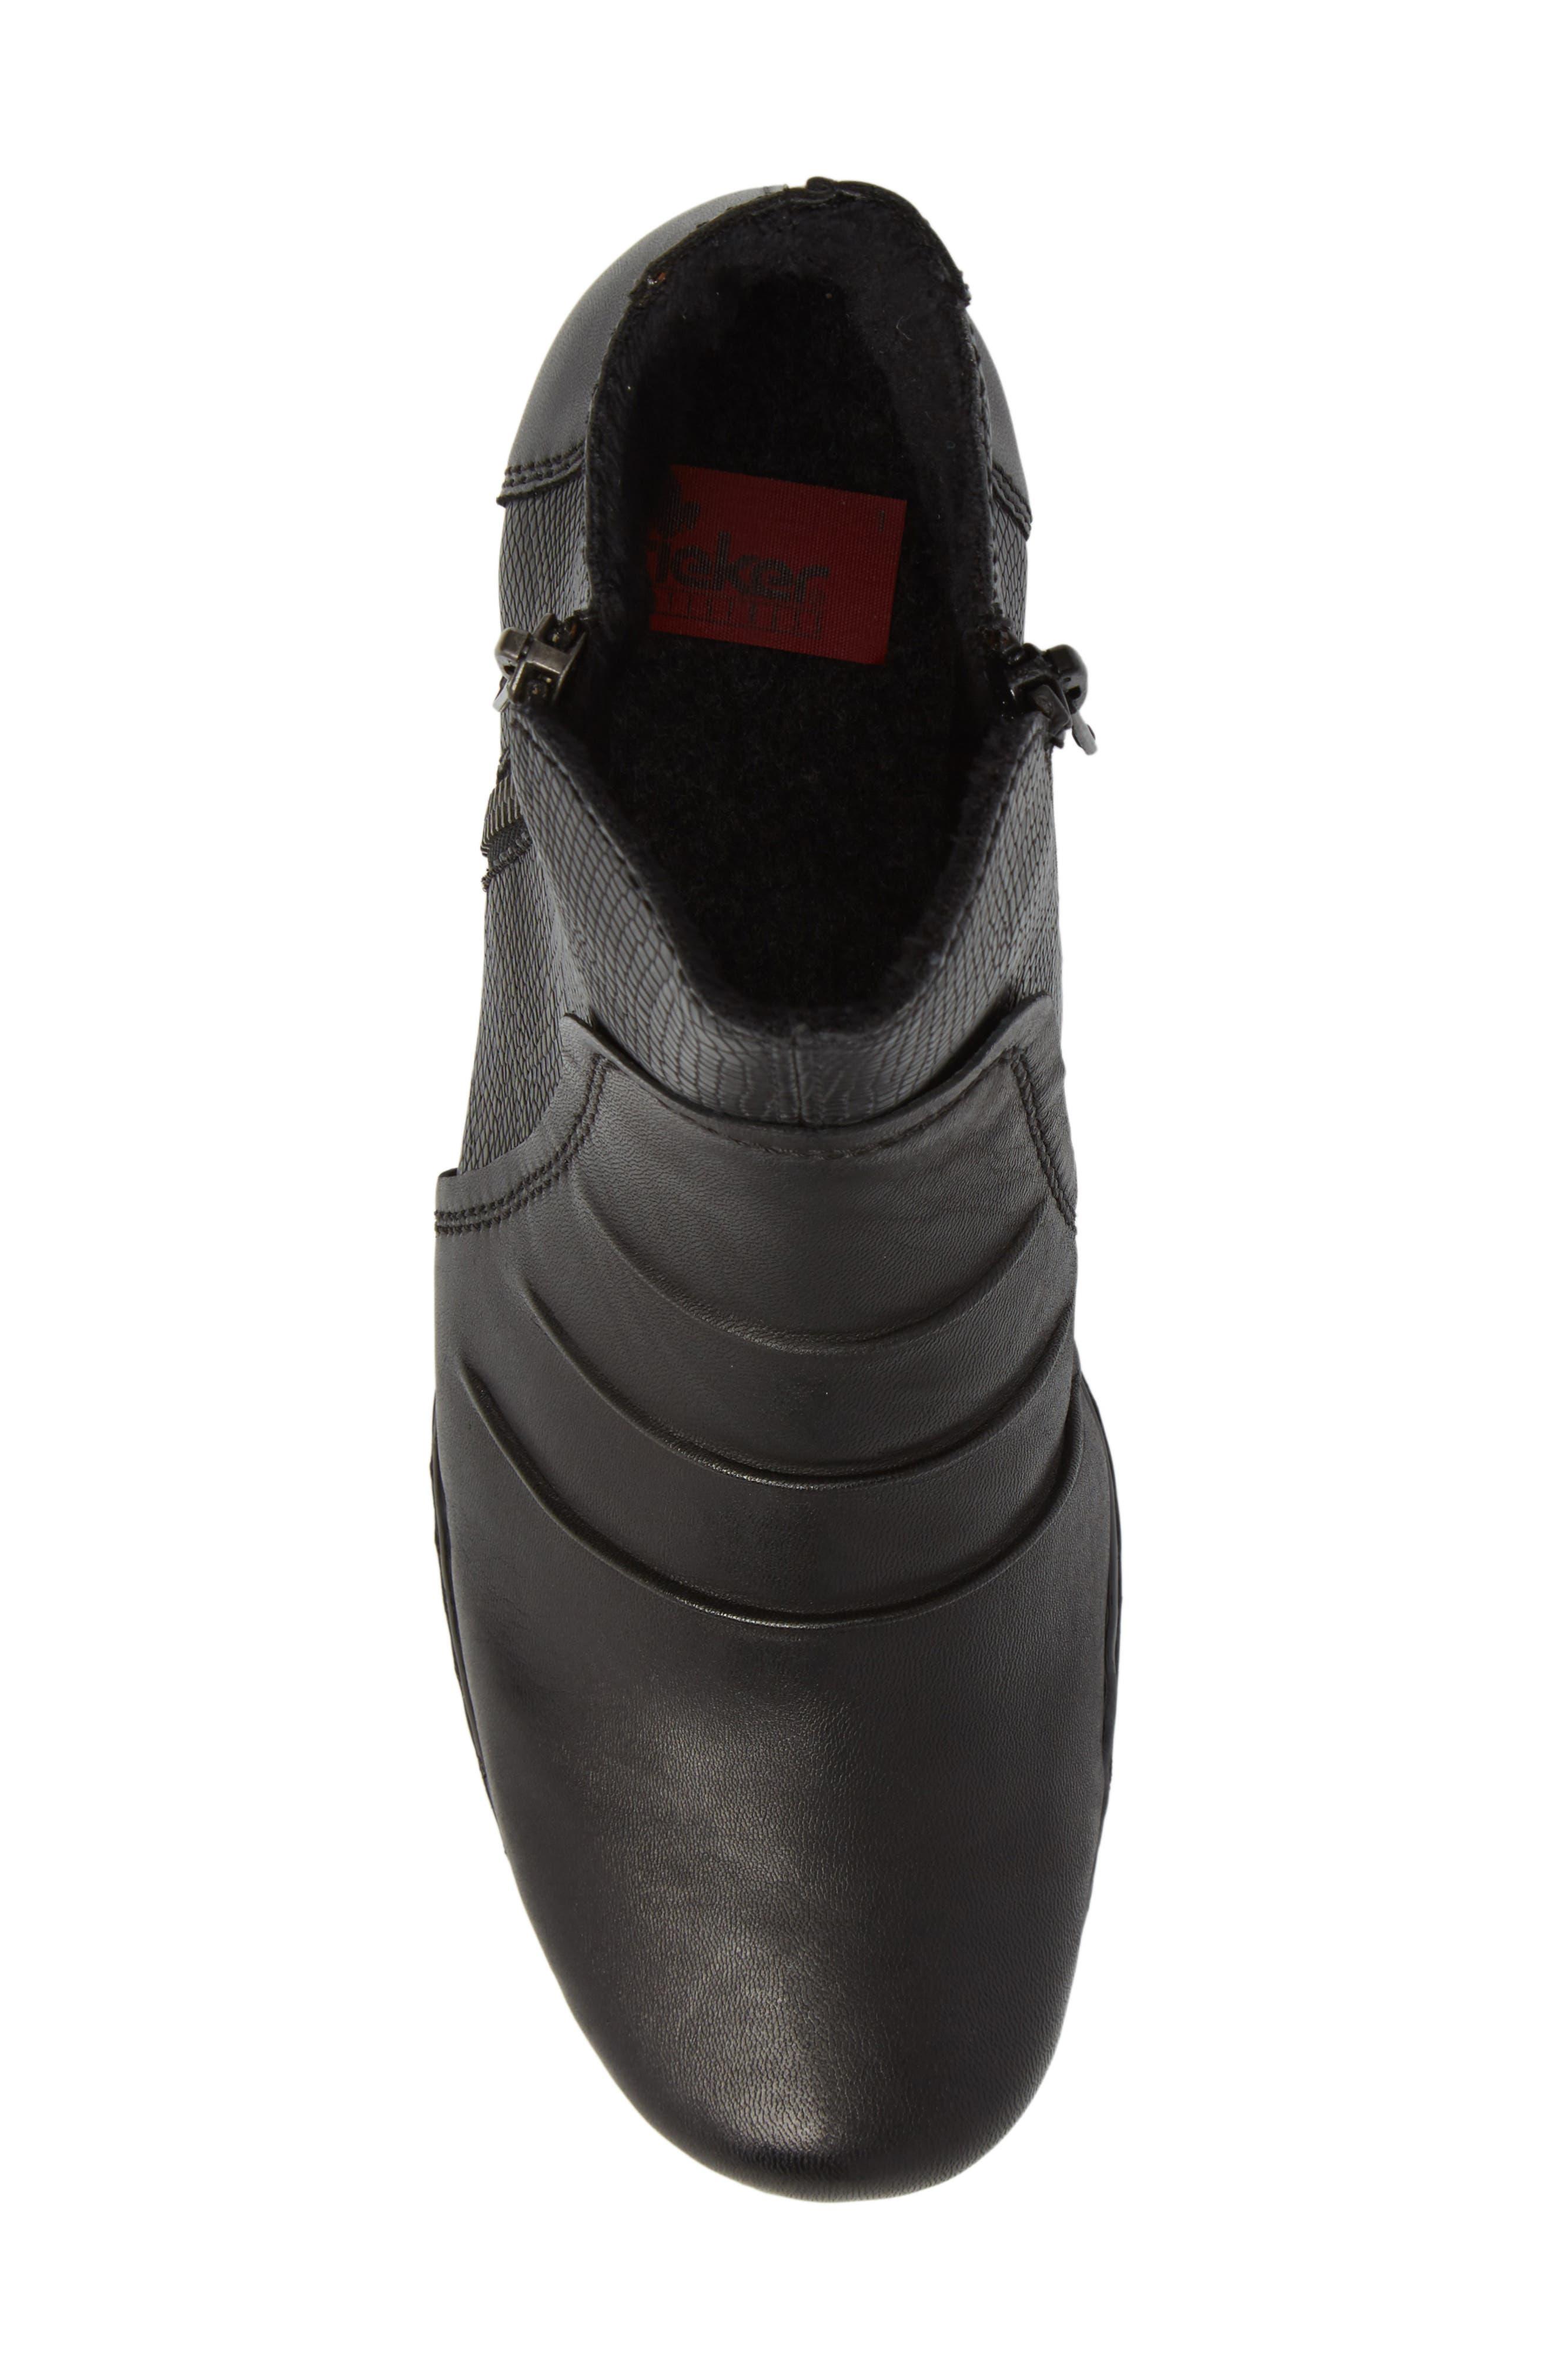 Lynn 62 Bootie,                             Alternate thumbnail 5, color,                             Schwarz Nero Leather